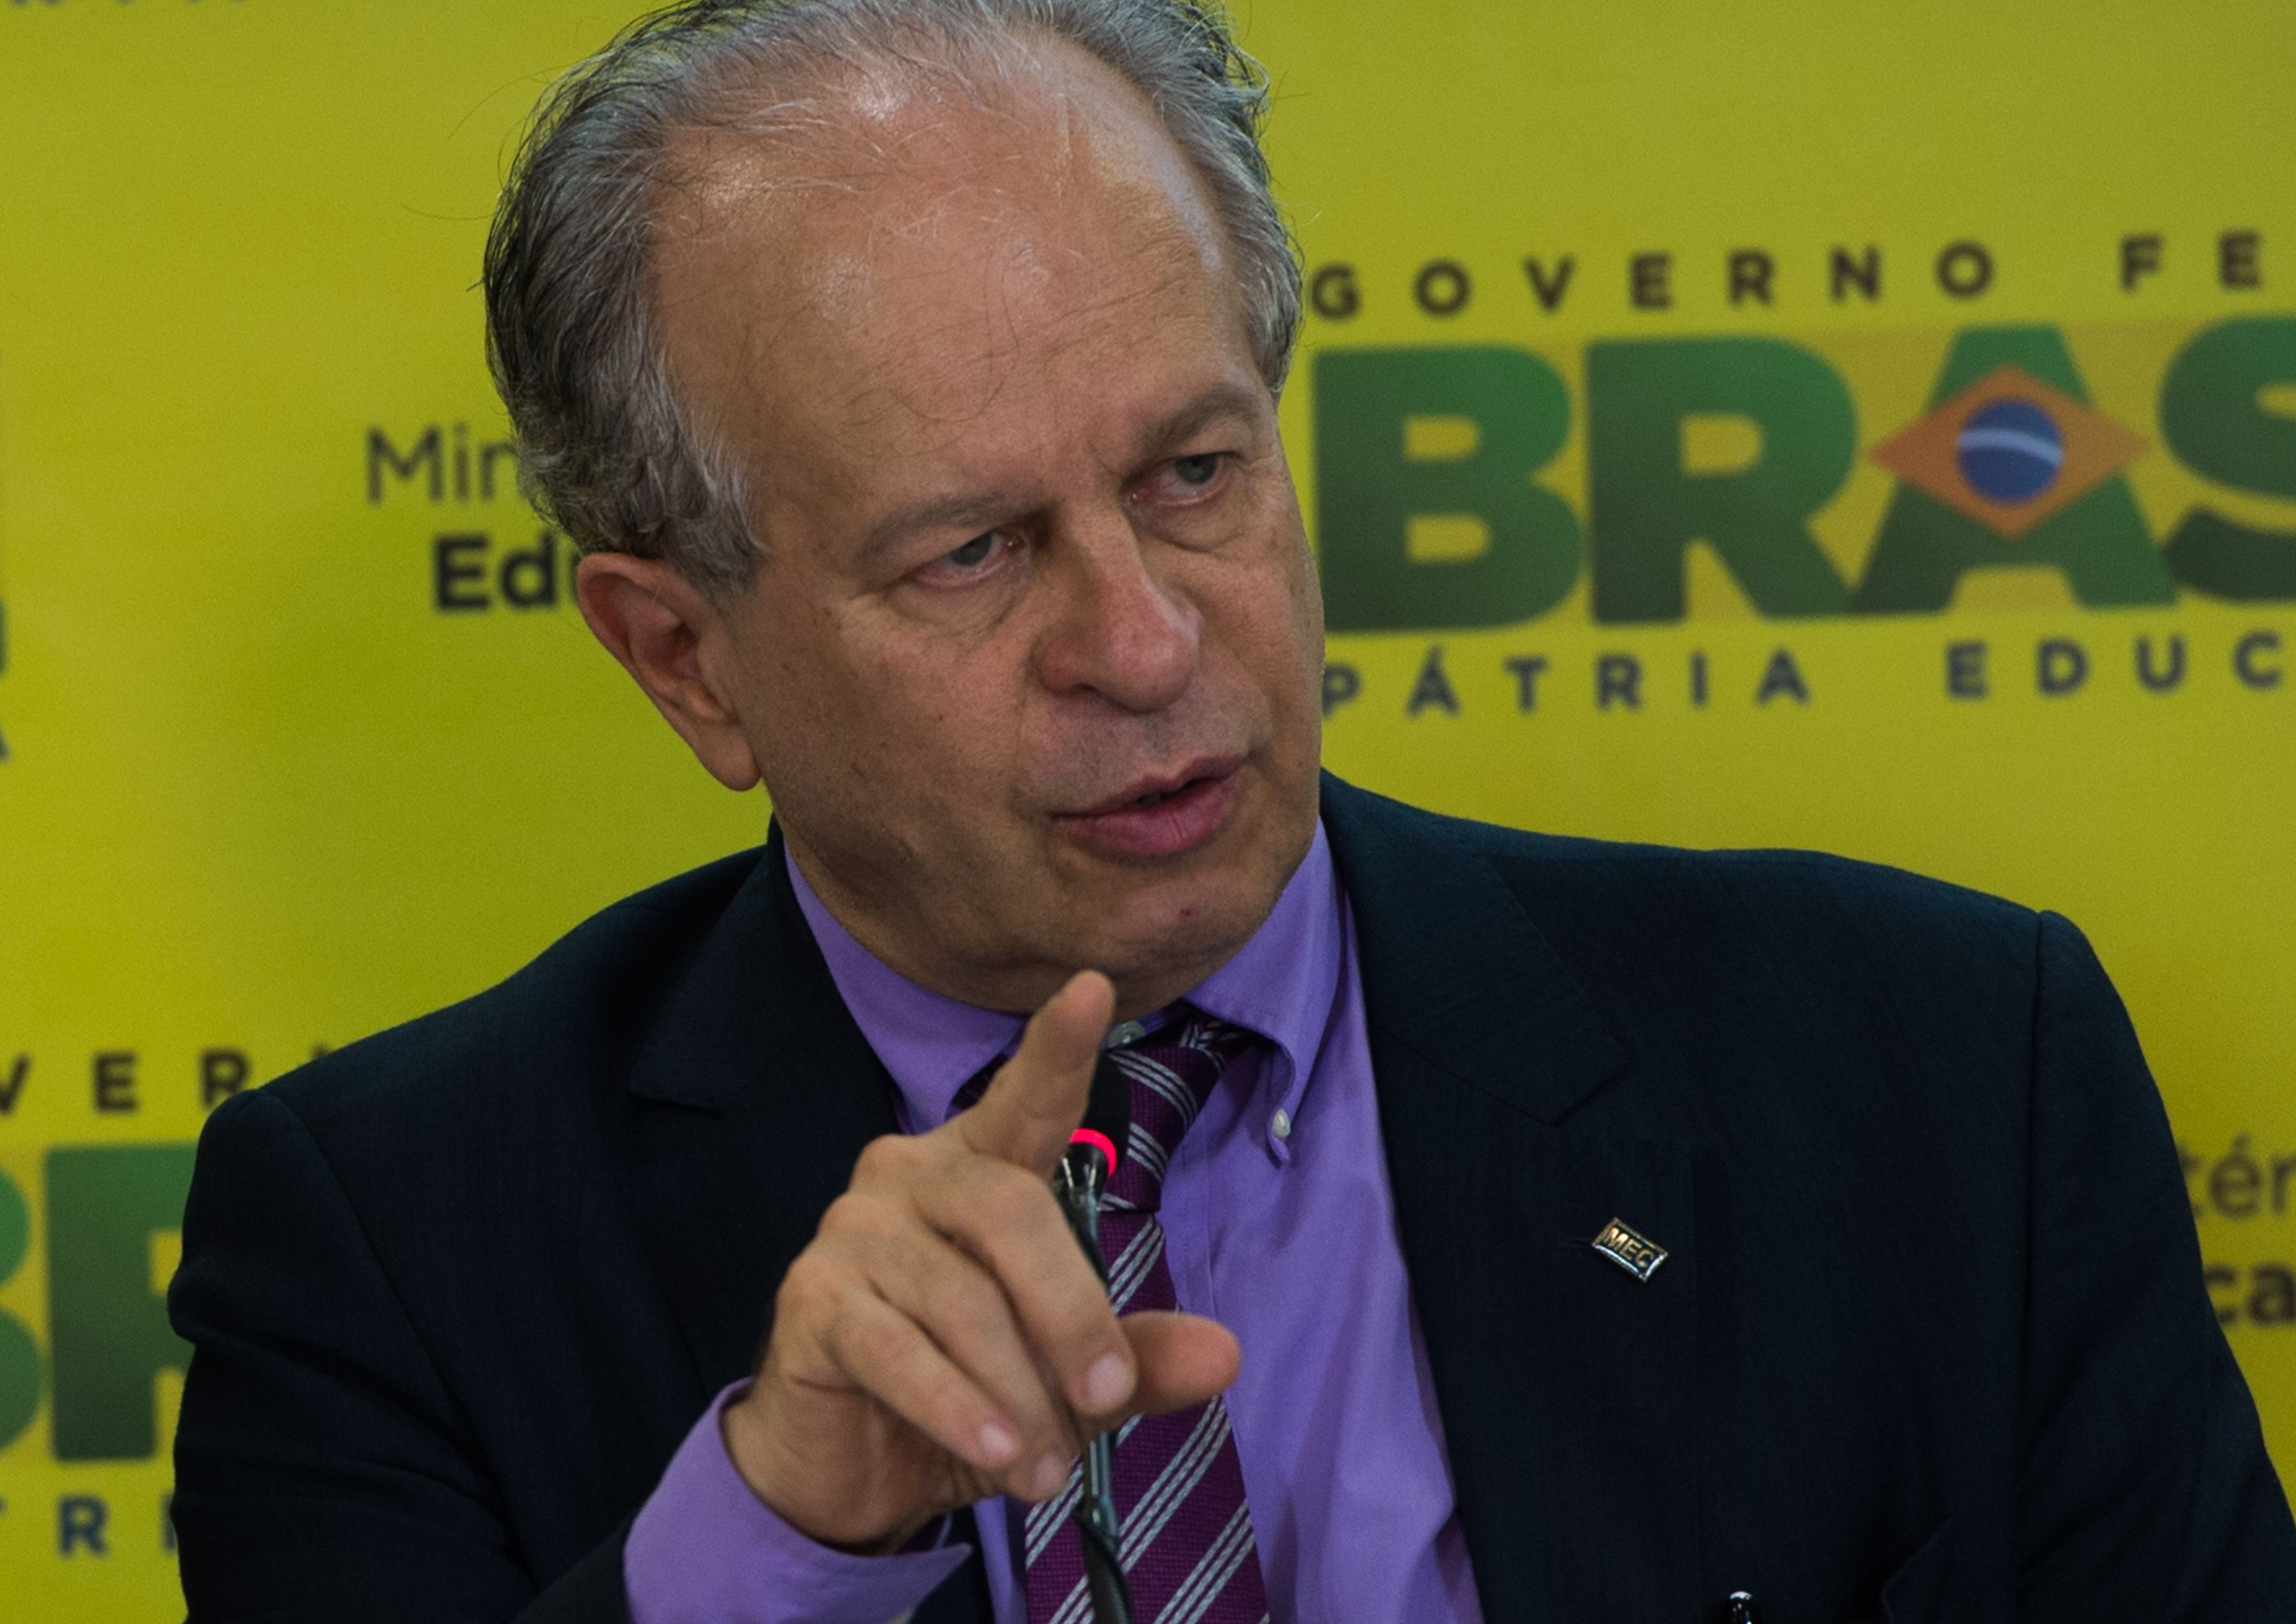 Reforma ministerial: Dilma demite Renato Janine da Educação